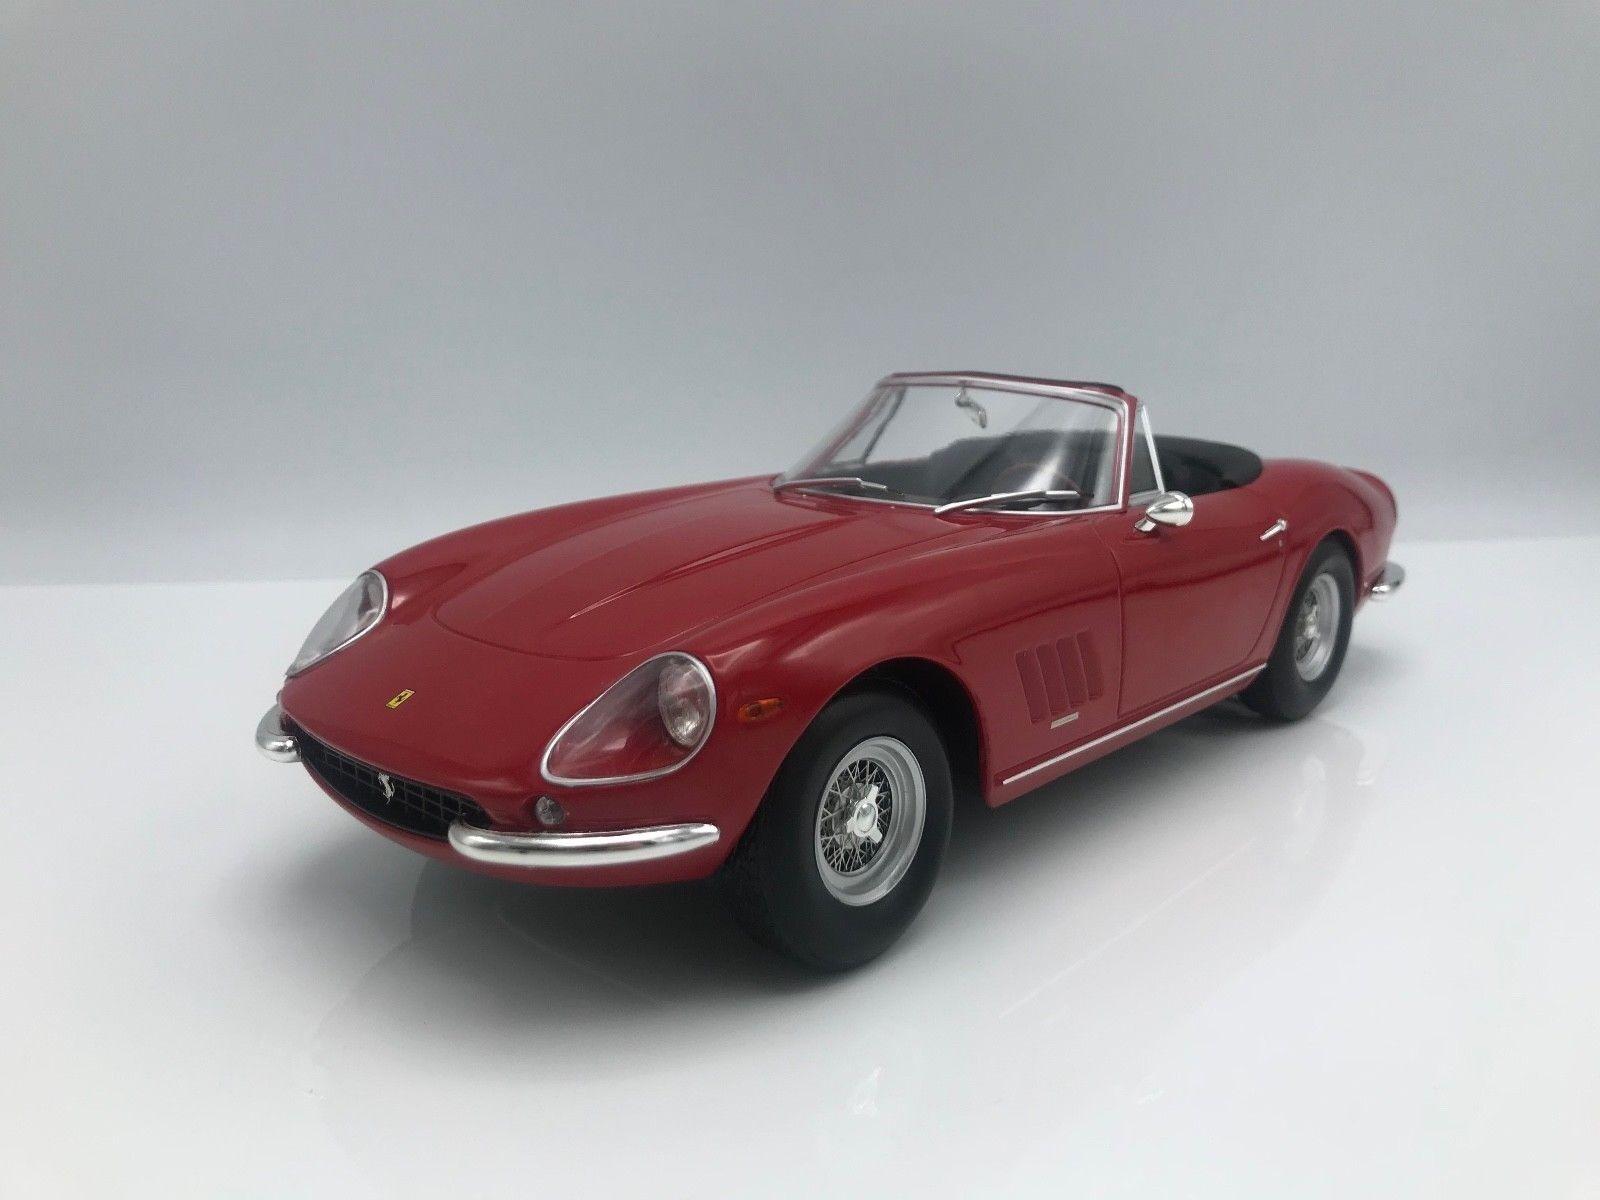 Ferrari 275 gtb 4 Nuts Spyder 1967 rouge - 1 18 KK-Scale    NEW